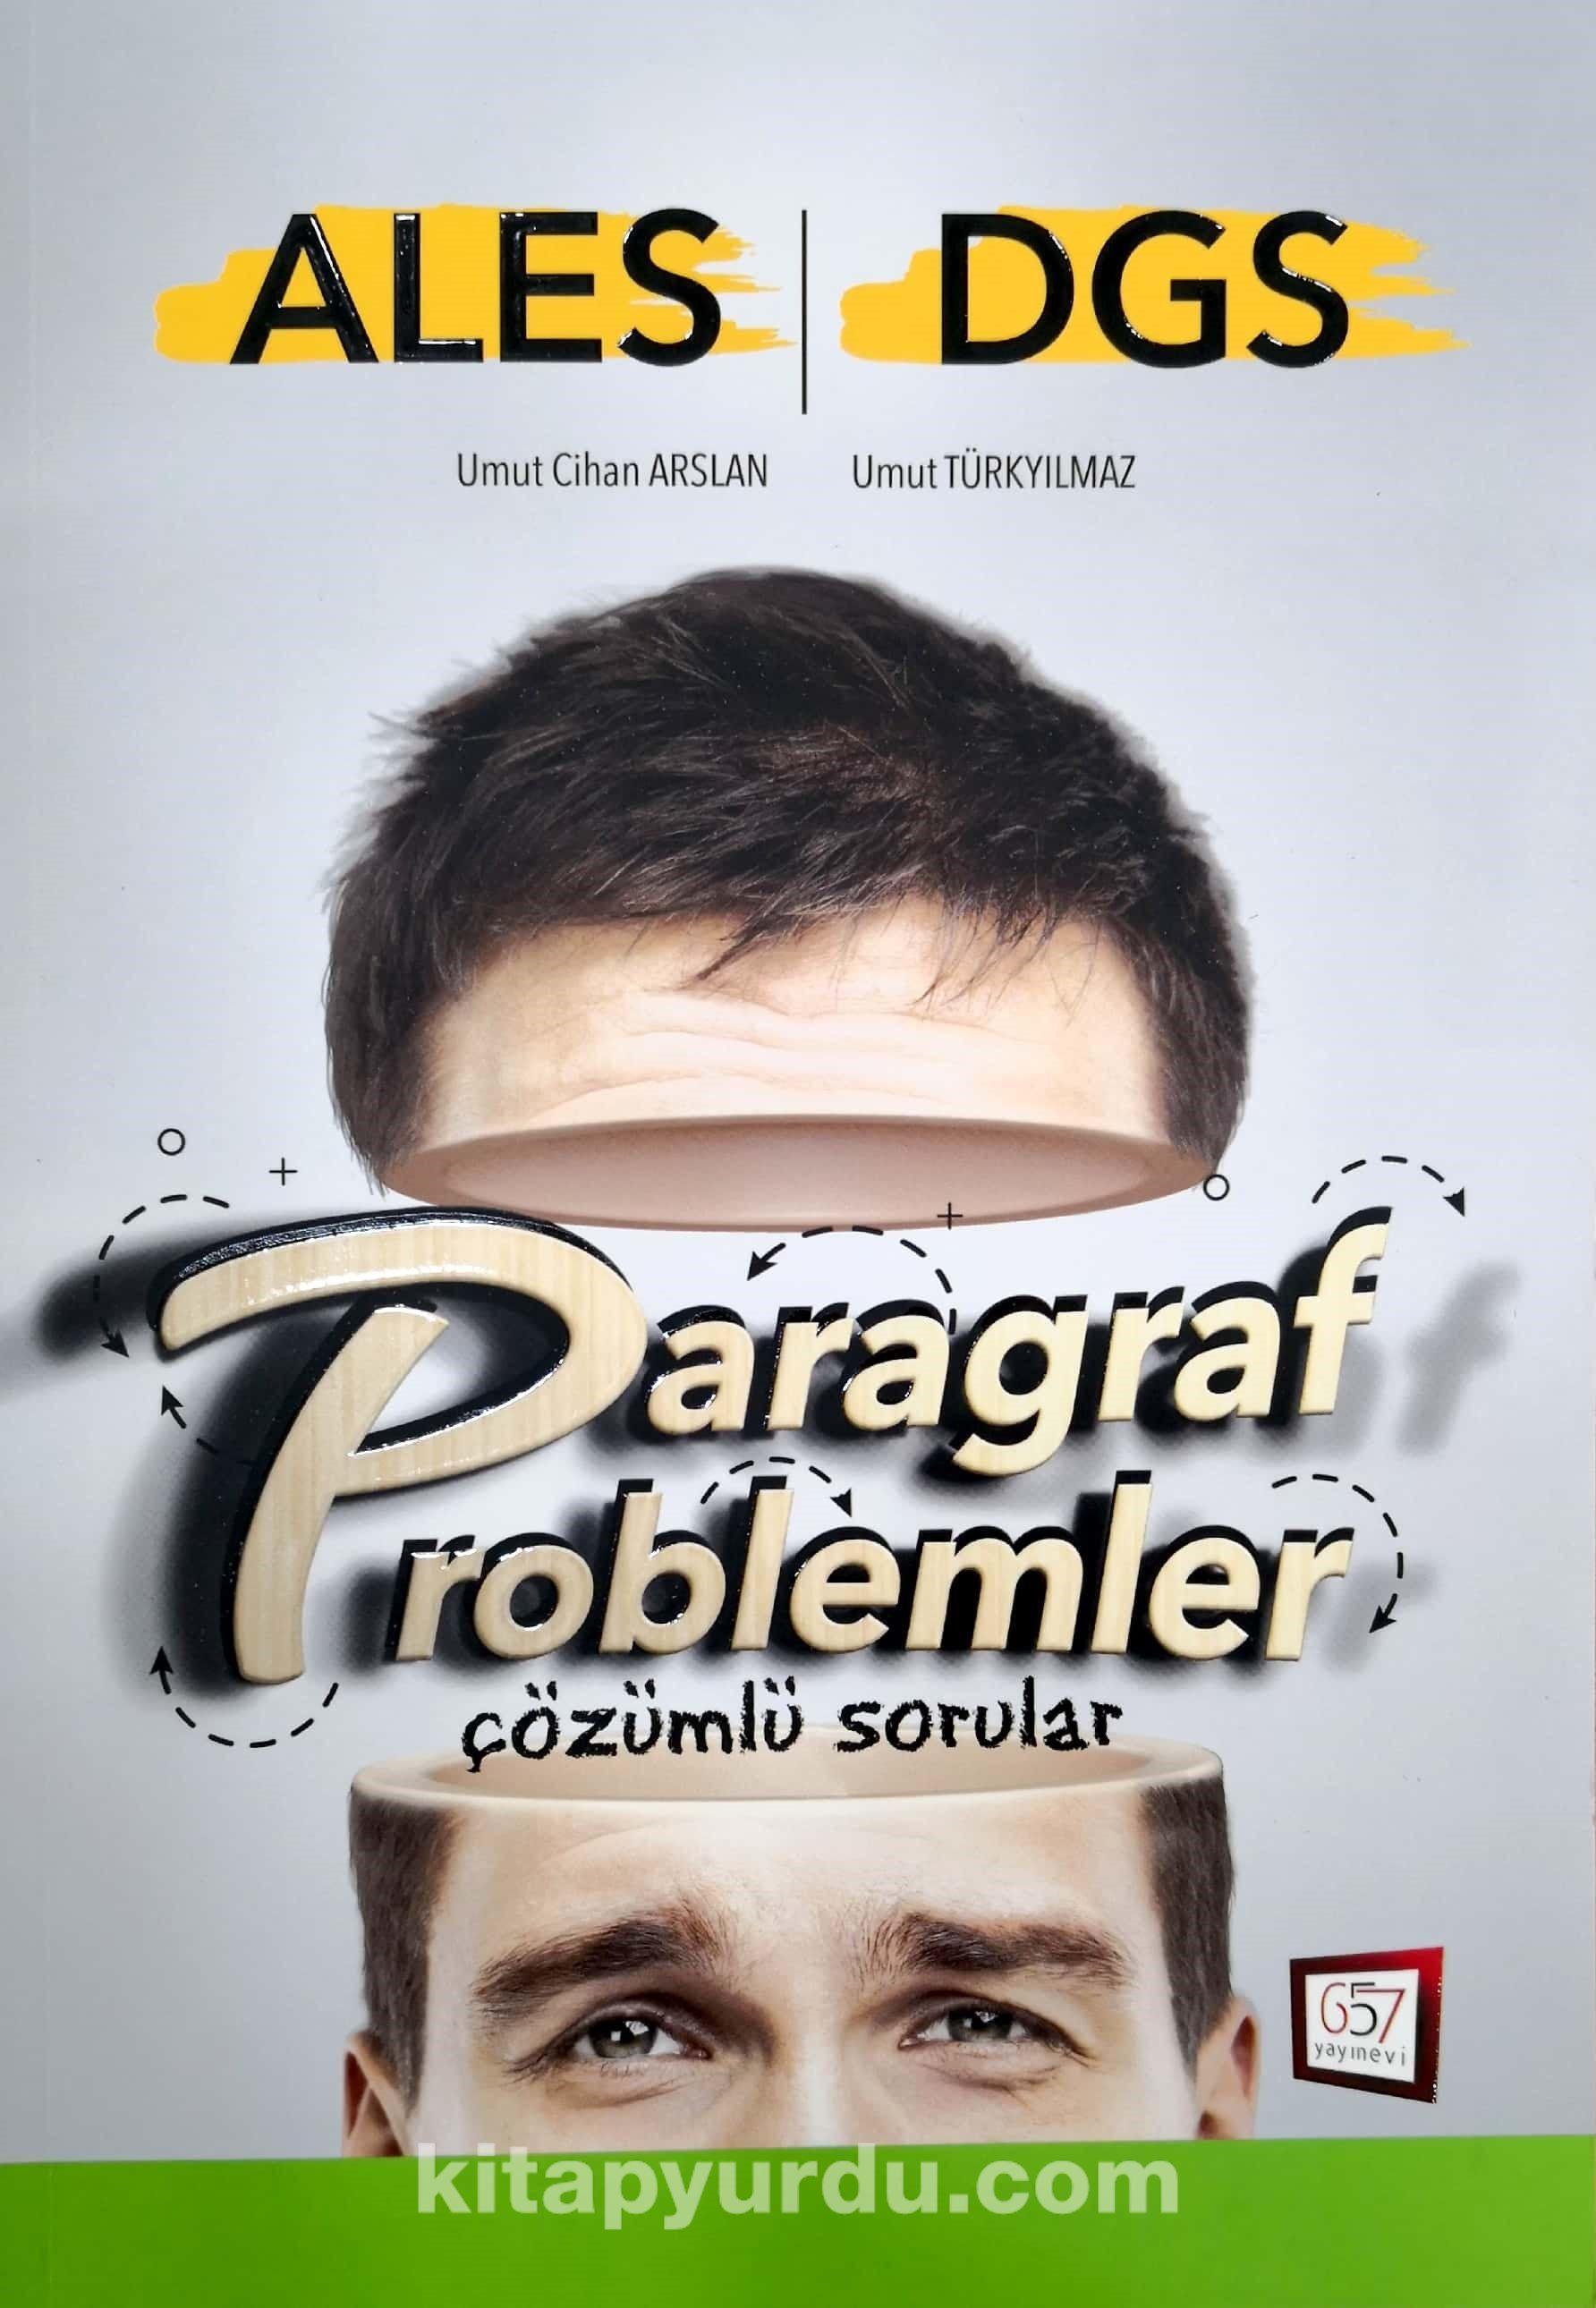 ALES DGS Paragraf Problemler Çözümlü Sorular - Umut Türkyılmaz pdf epub